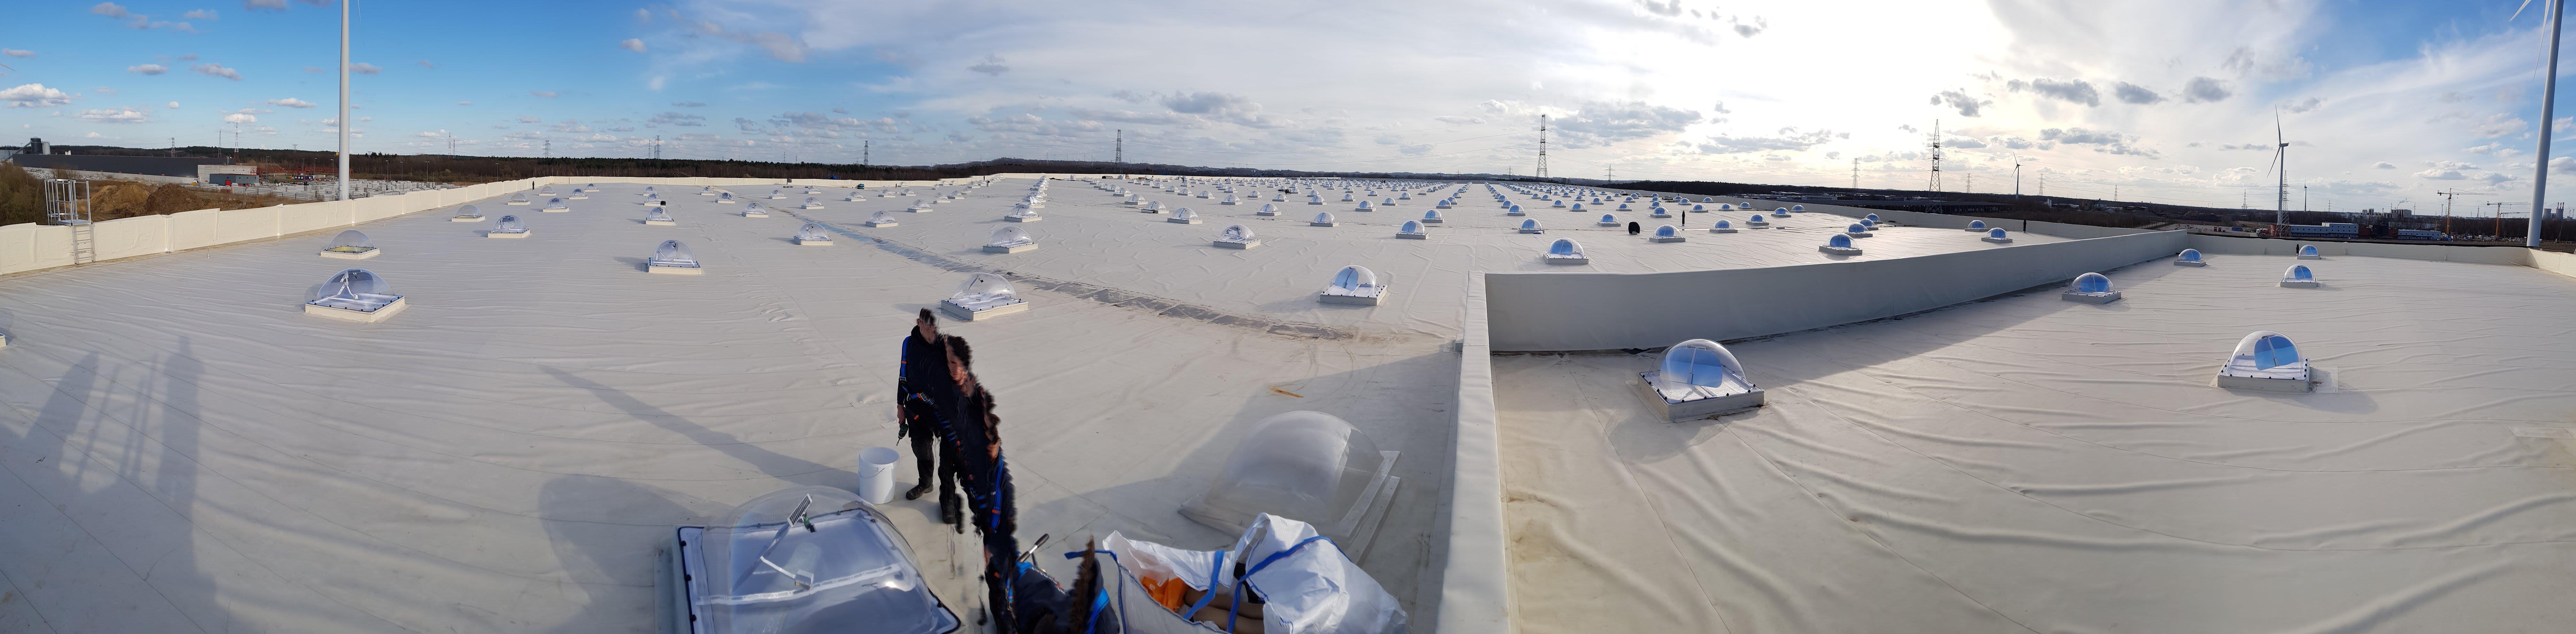 skylight-dome-edc-carglass-montea-11